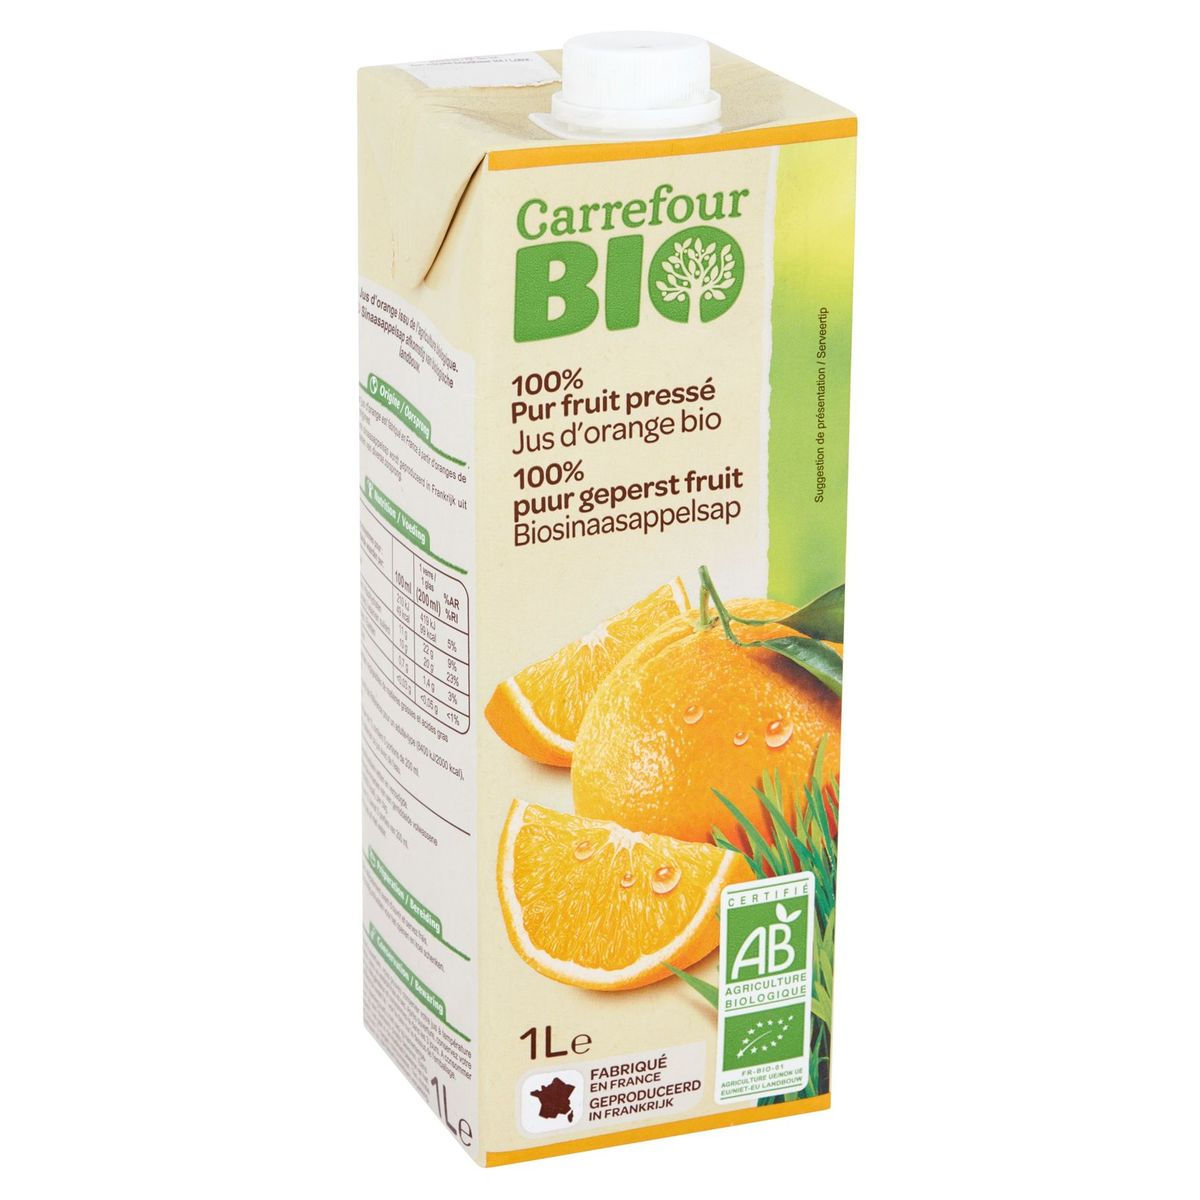 Carrefour Bio 100% Puur Geperst Fruit Biosinaasappelsap 1 L